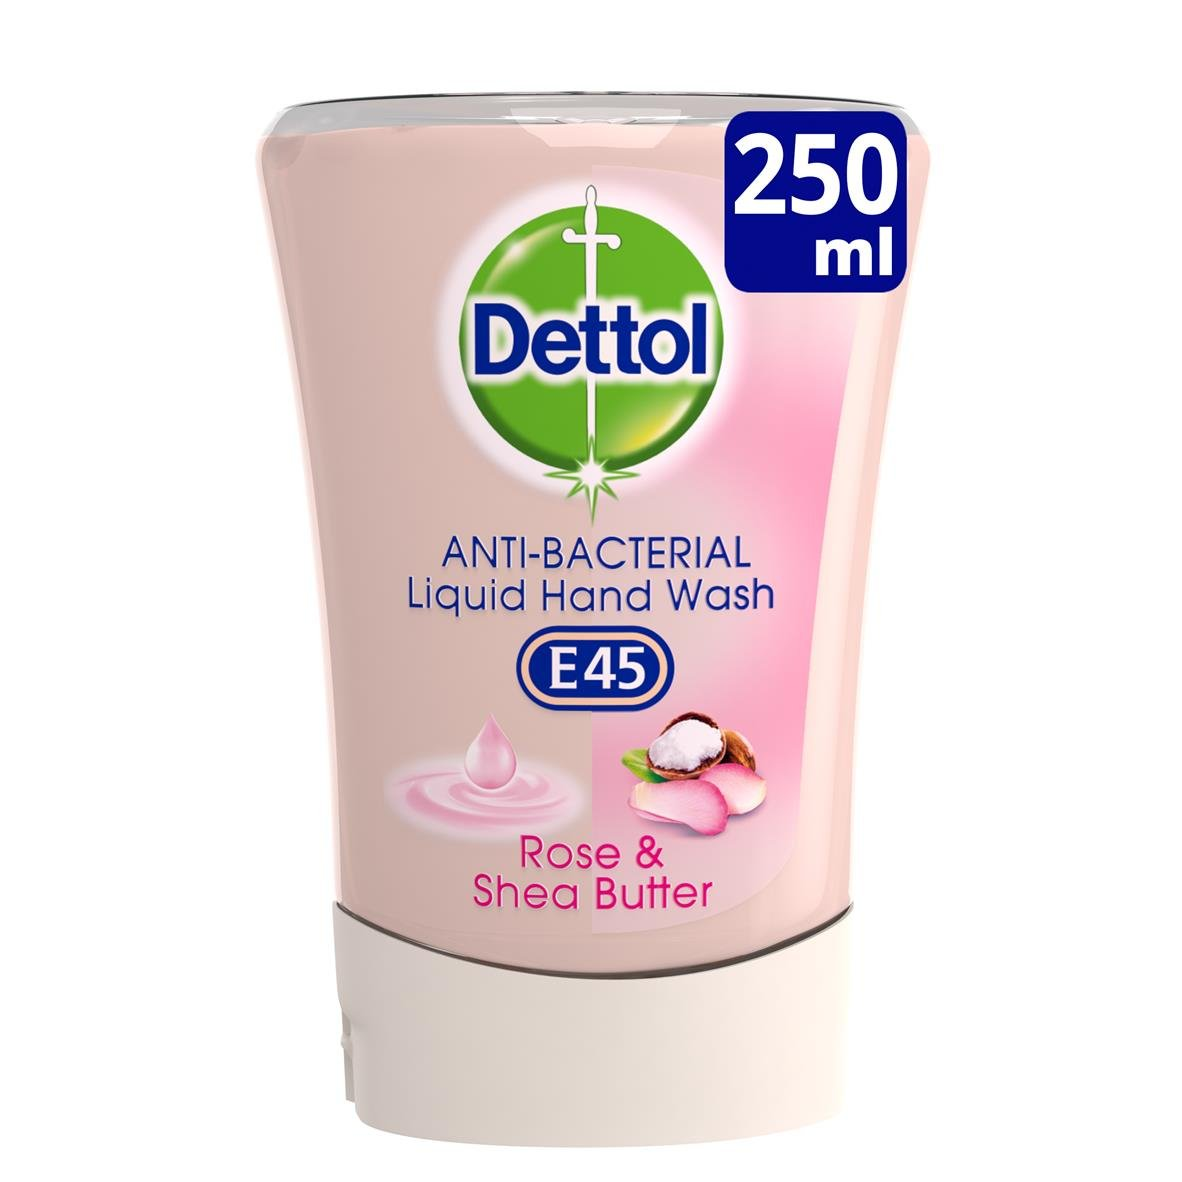 Dettol No-Touch Refill Anti-Bacterial Hand Wash, Rose and Shea Butter, 250 ml Reckitt Benckiser 106527741